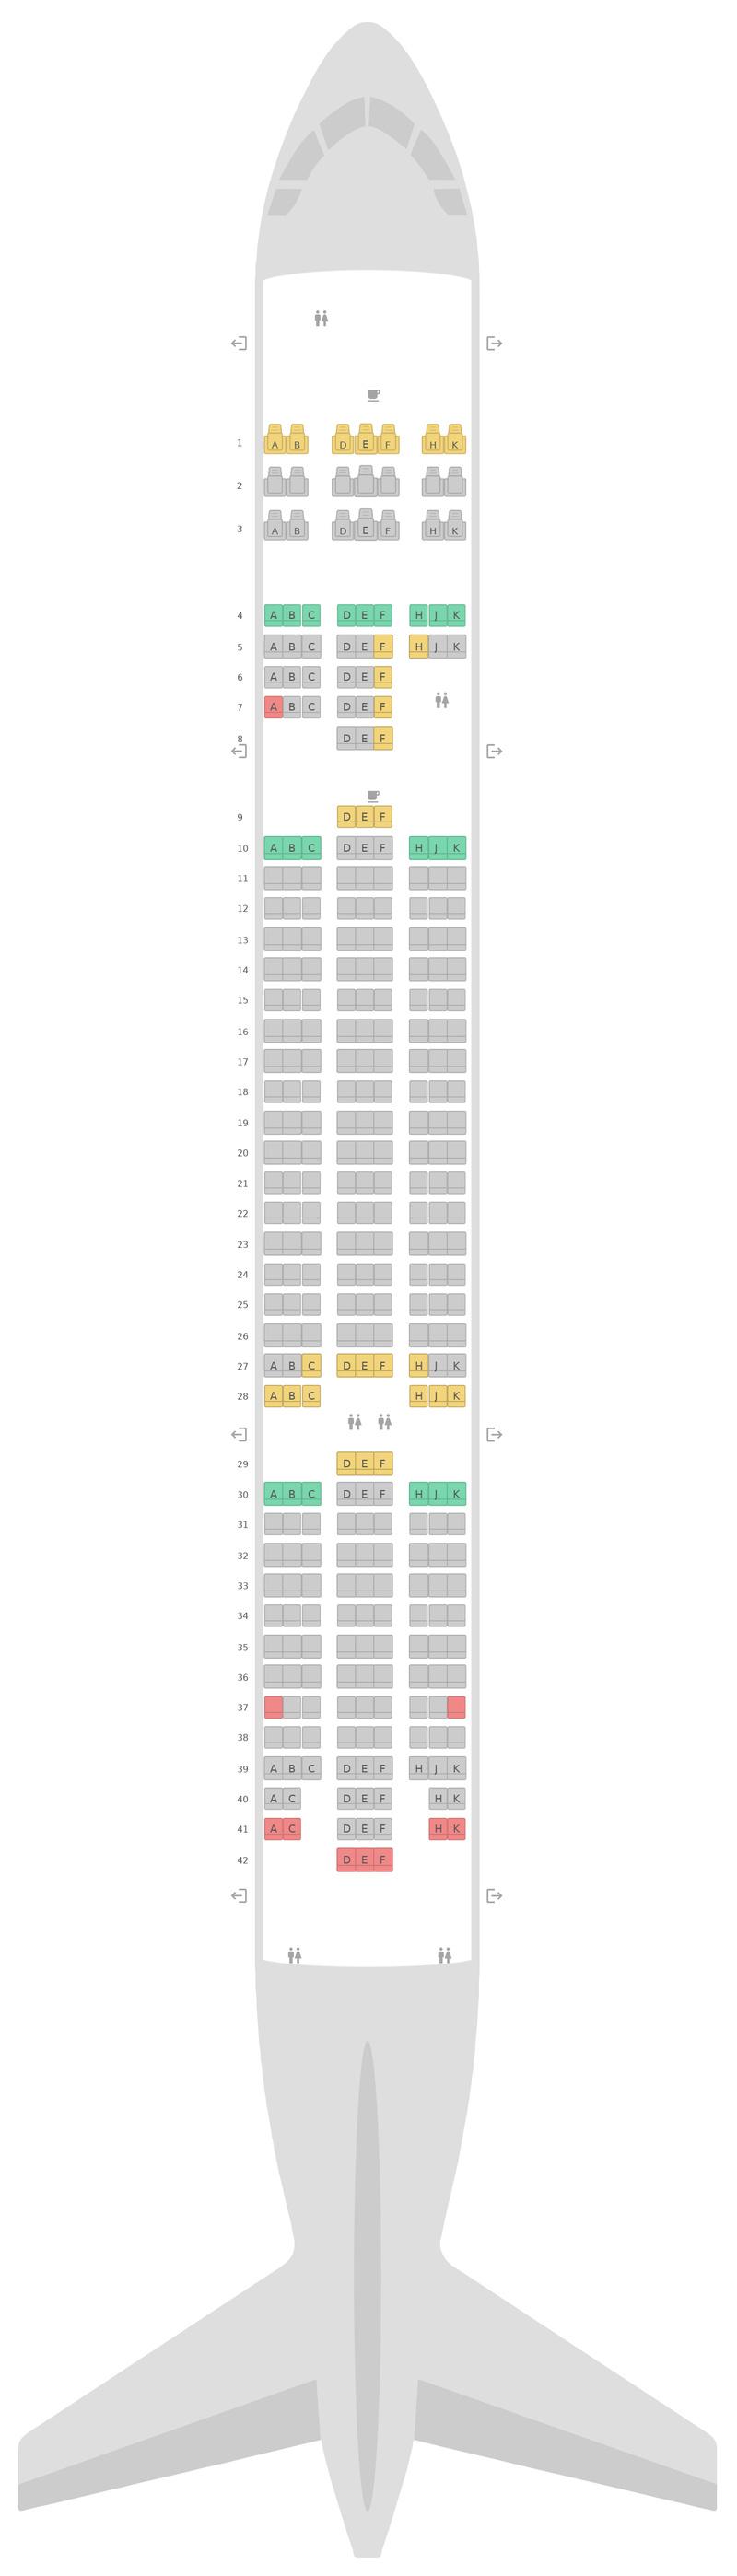 Sitzplan Boeing 787-8 (788) v1 Scoot